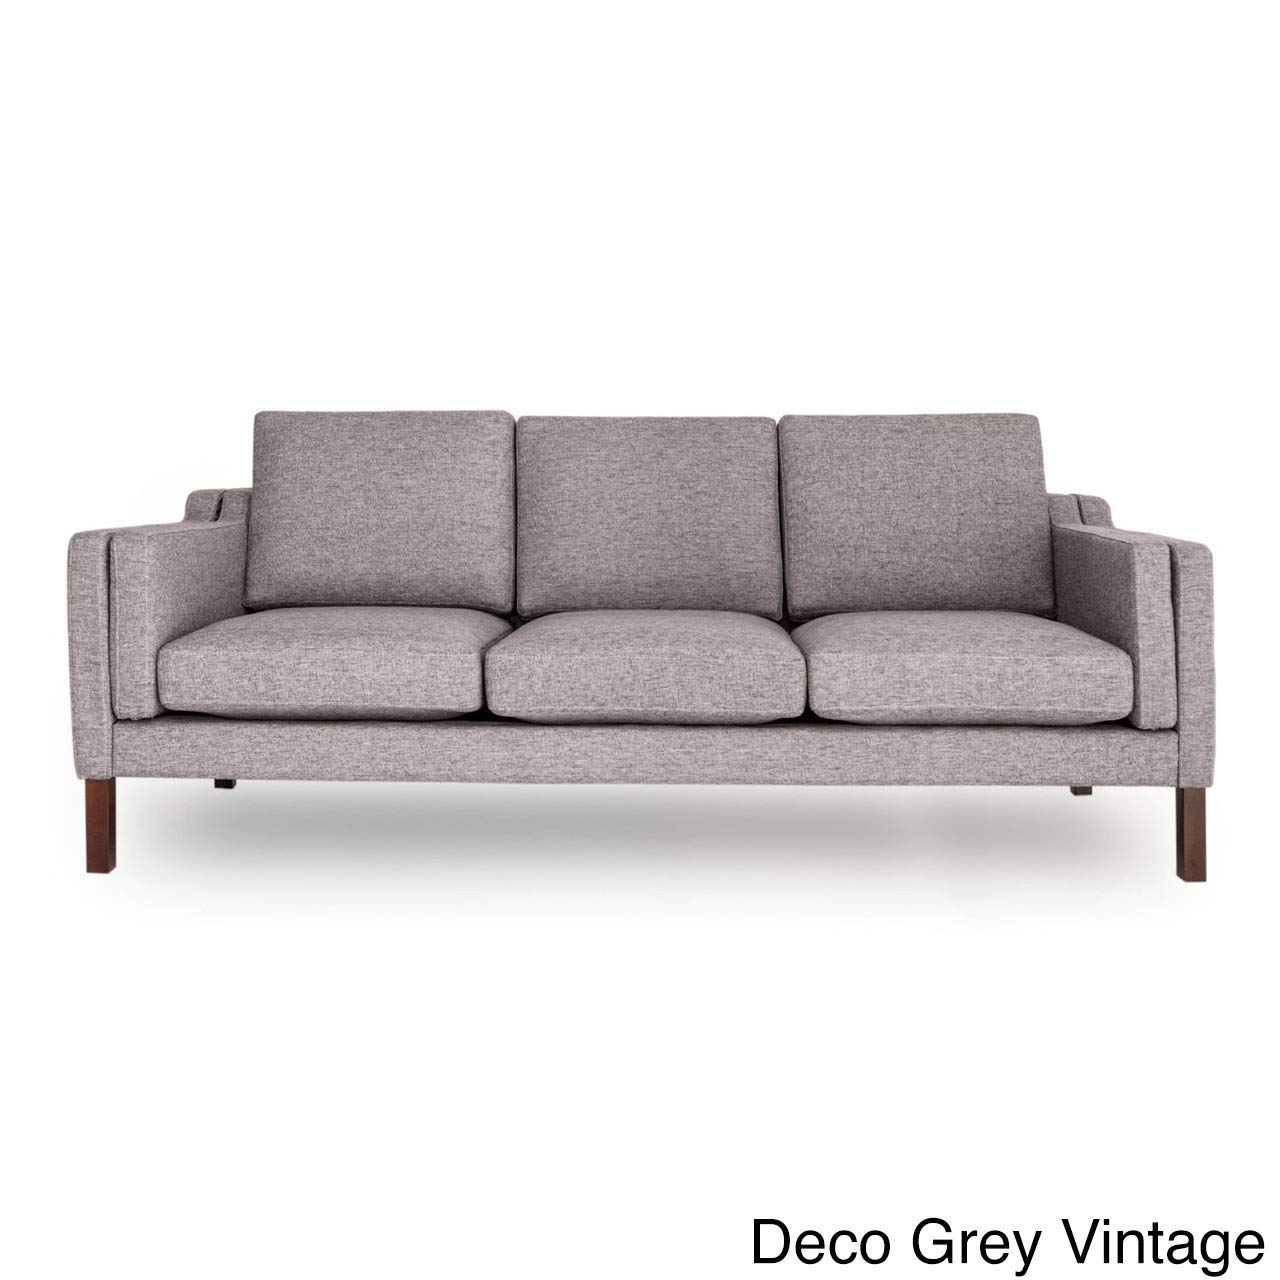 Mid-Century Modern Premium Fabric 3 Seat Sofa - Grey - Modern & Contemporary/Mid-Century Modern Sofa Cushions Patio Home Style Cushion CHOOSEandBUY